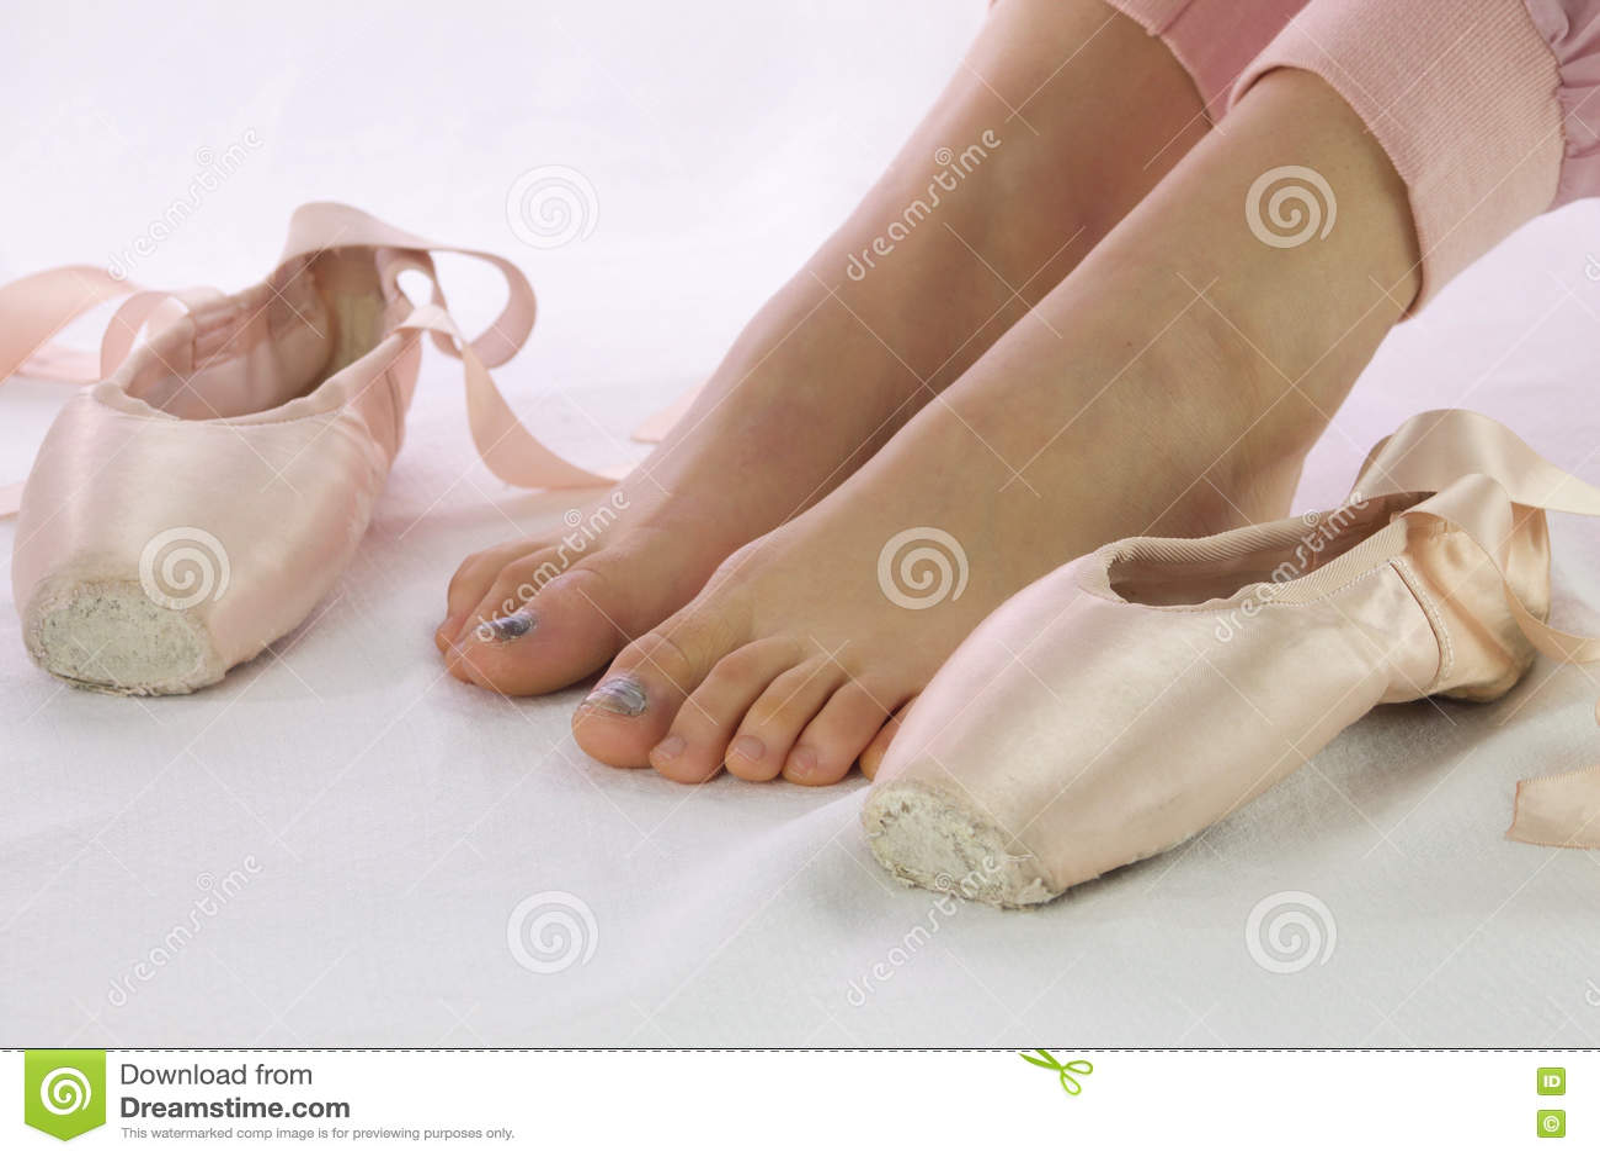 Ballerina feet near pointe shoes isolated